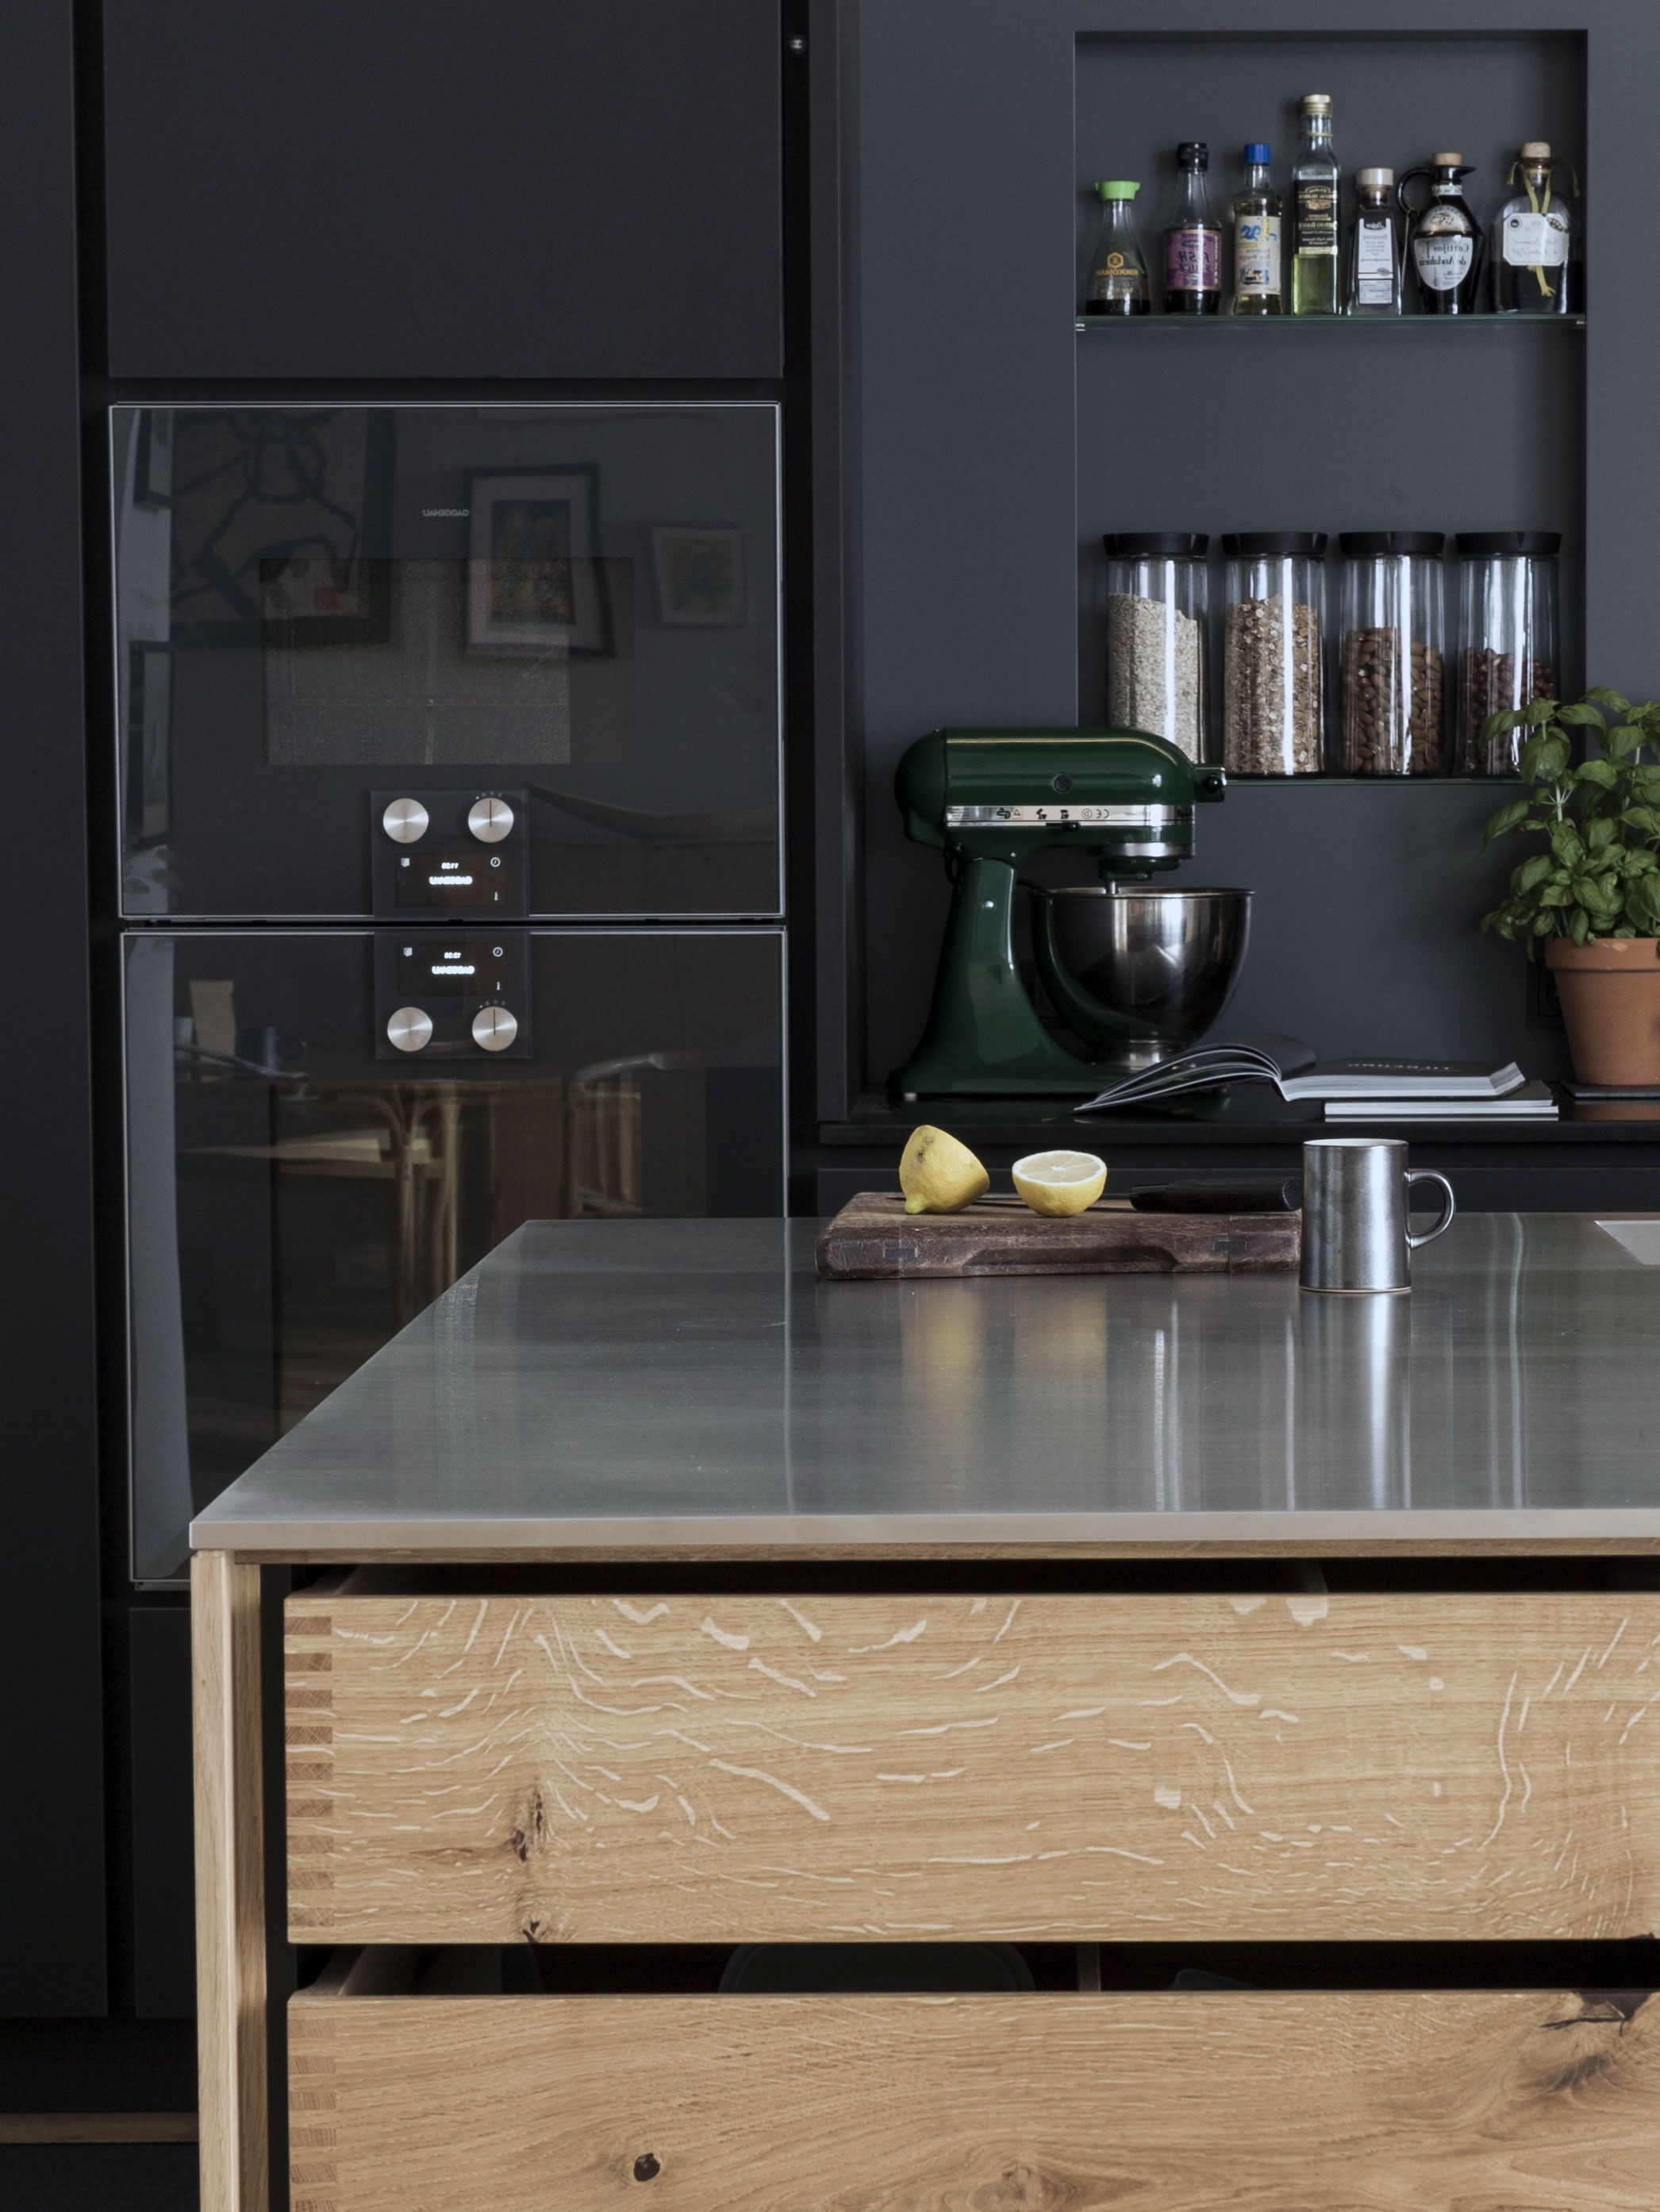 65 Beautiful Modern Scandinavian Kitchen Ideas You Will Love In 2020 Scandinavian Kitchen Scandinavian Kitchen Design Contemporary Kitchen